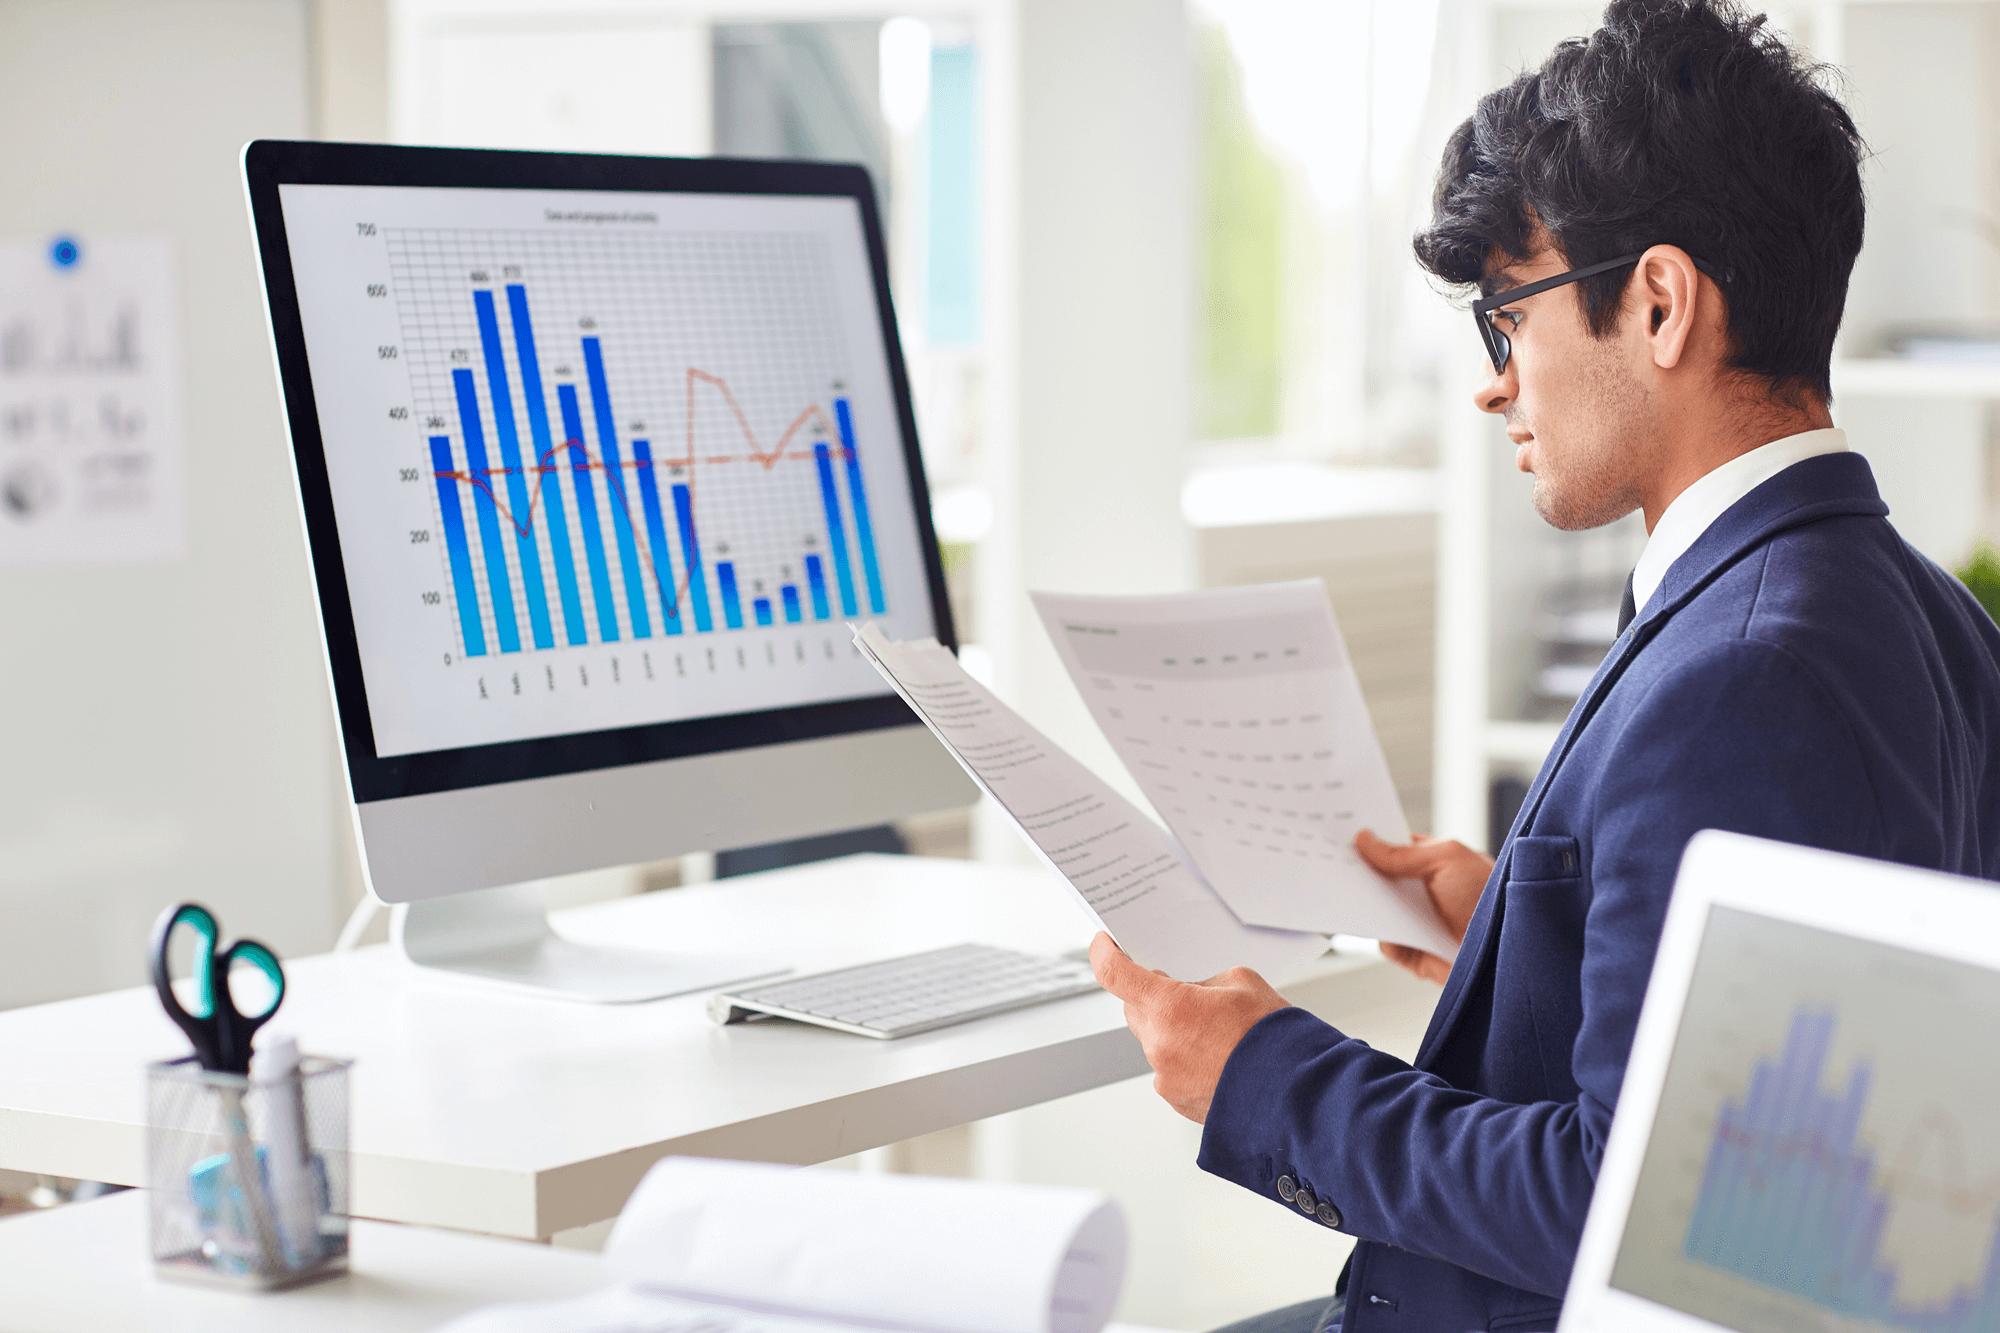 Controllers & Big Data   Een perfecte, innovatieve match